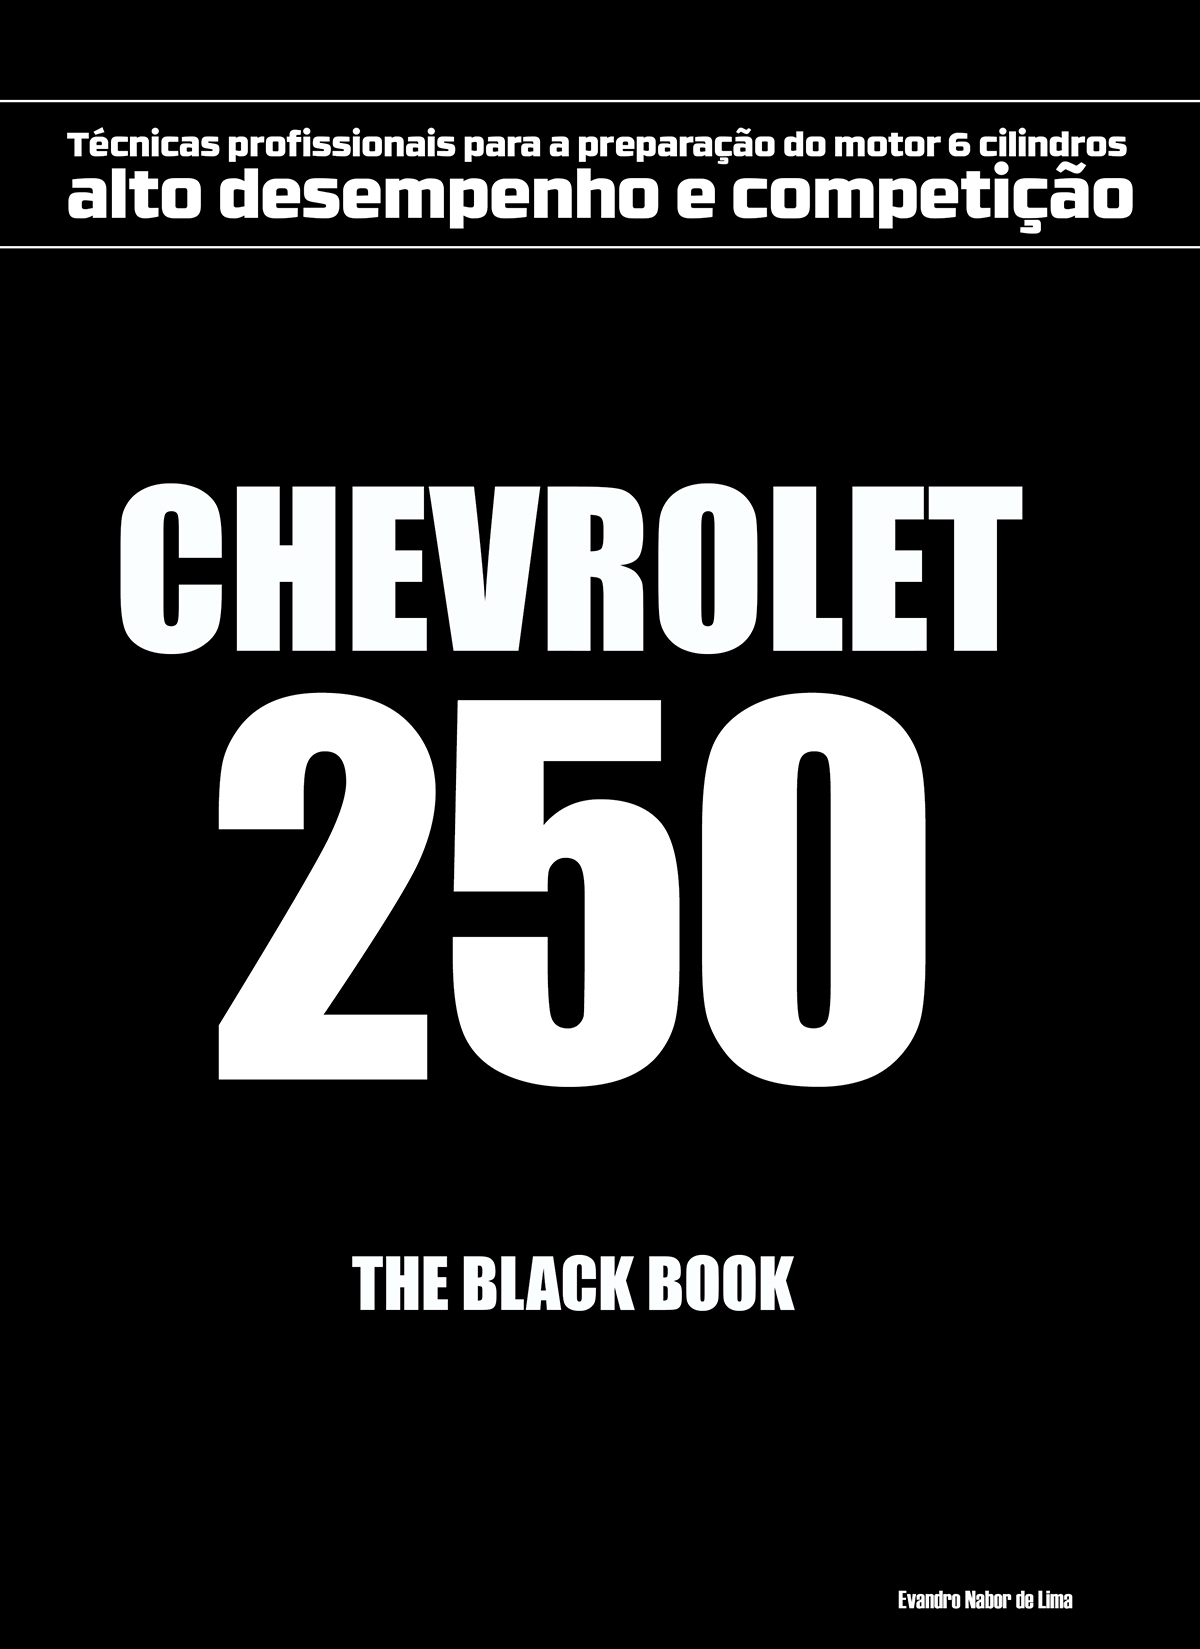 Chevrolet 250 - The Black book 1